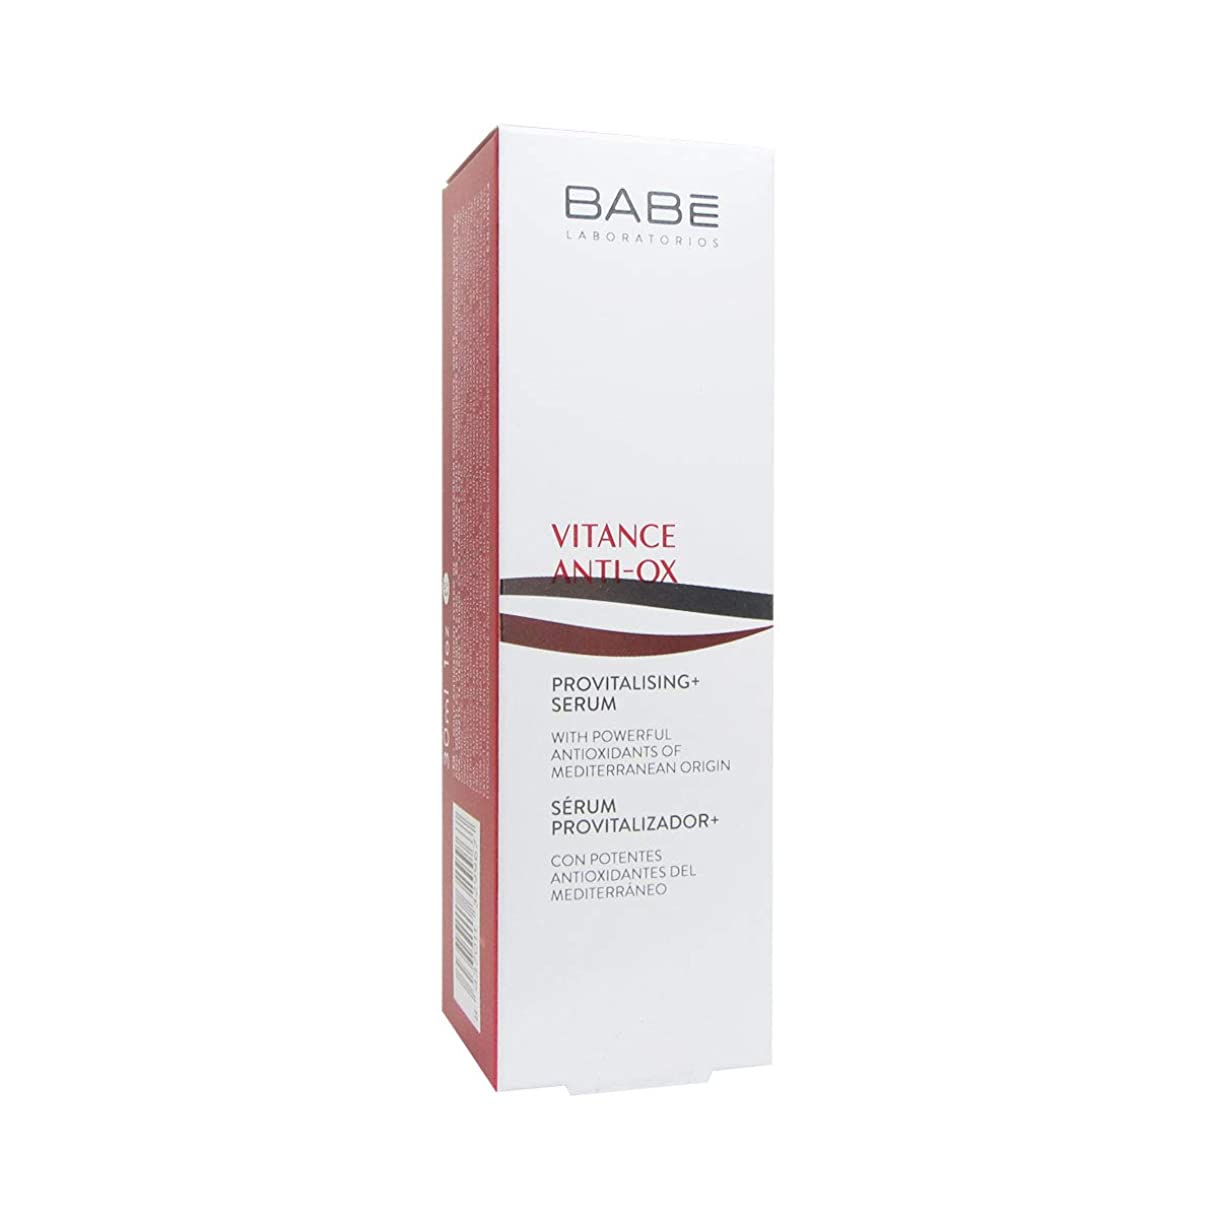 平方原子記念碑的なBaby Vitance Anti-ox Serum Pro Vitalisante 30ml [並行輸入品]